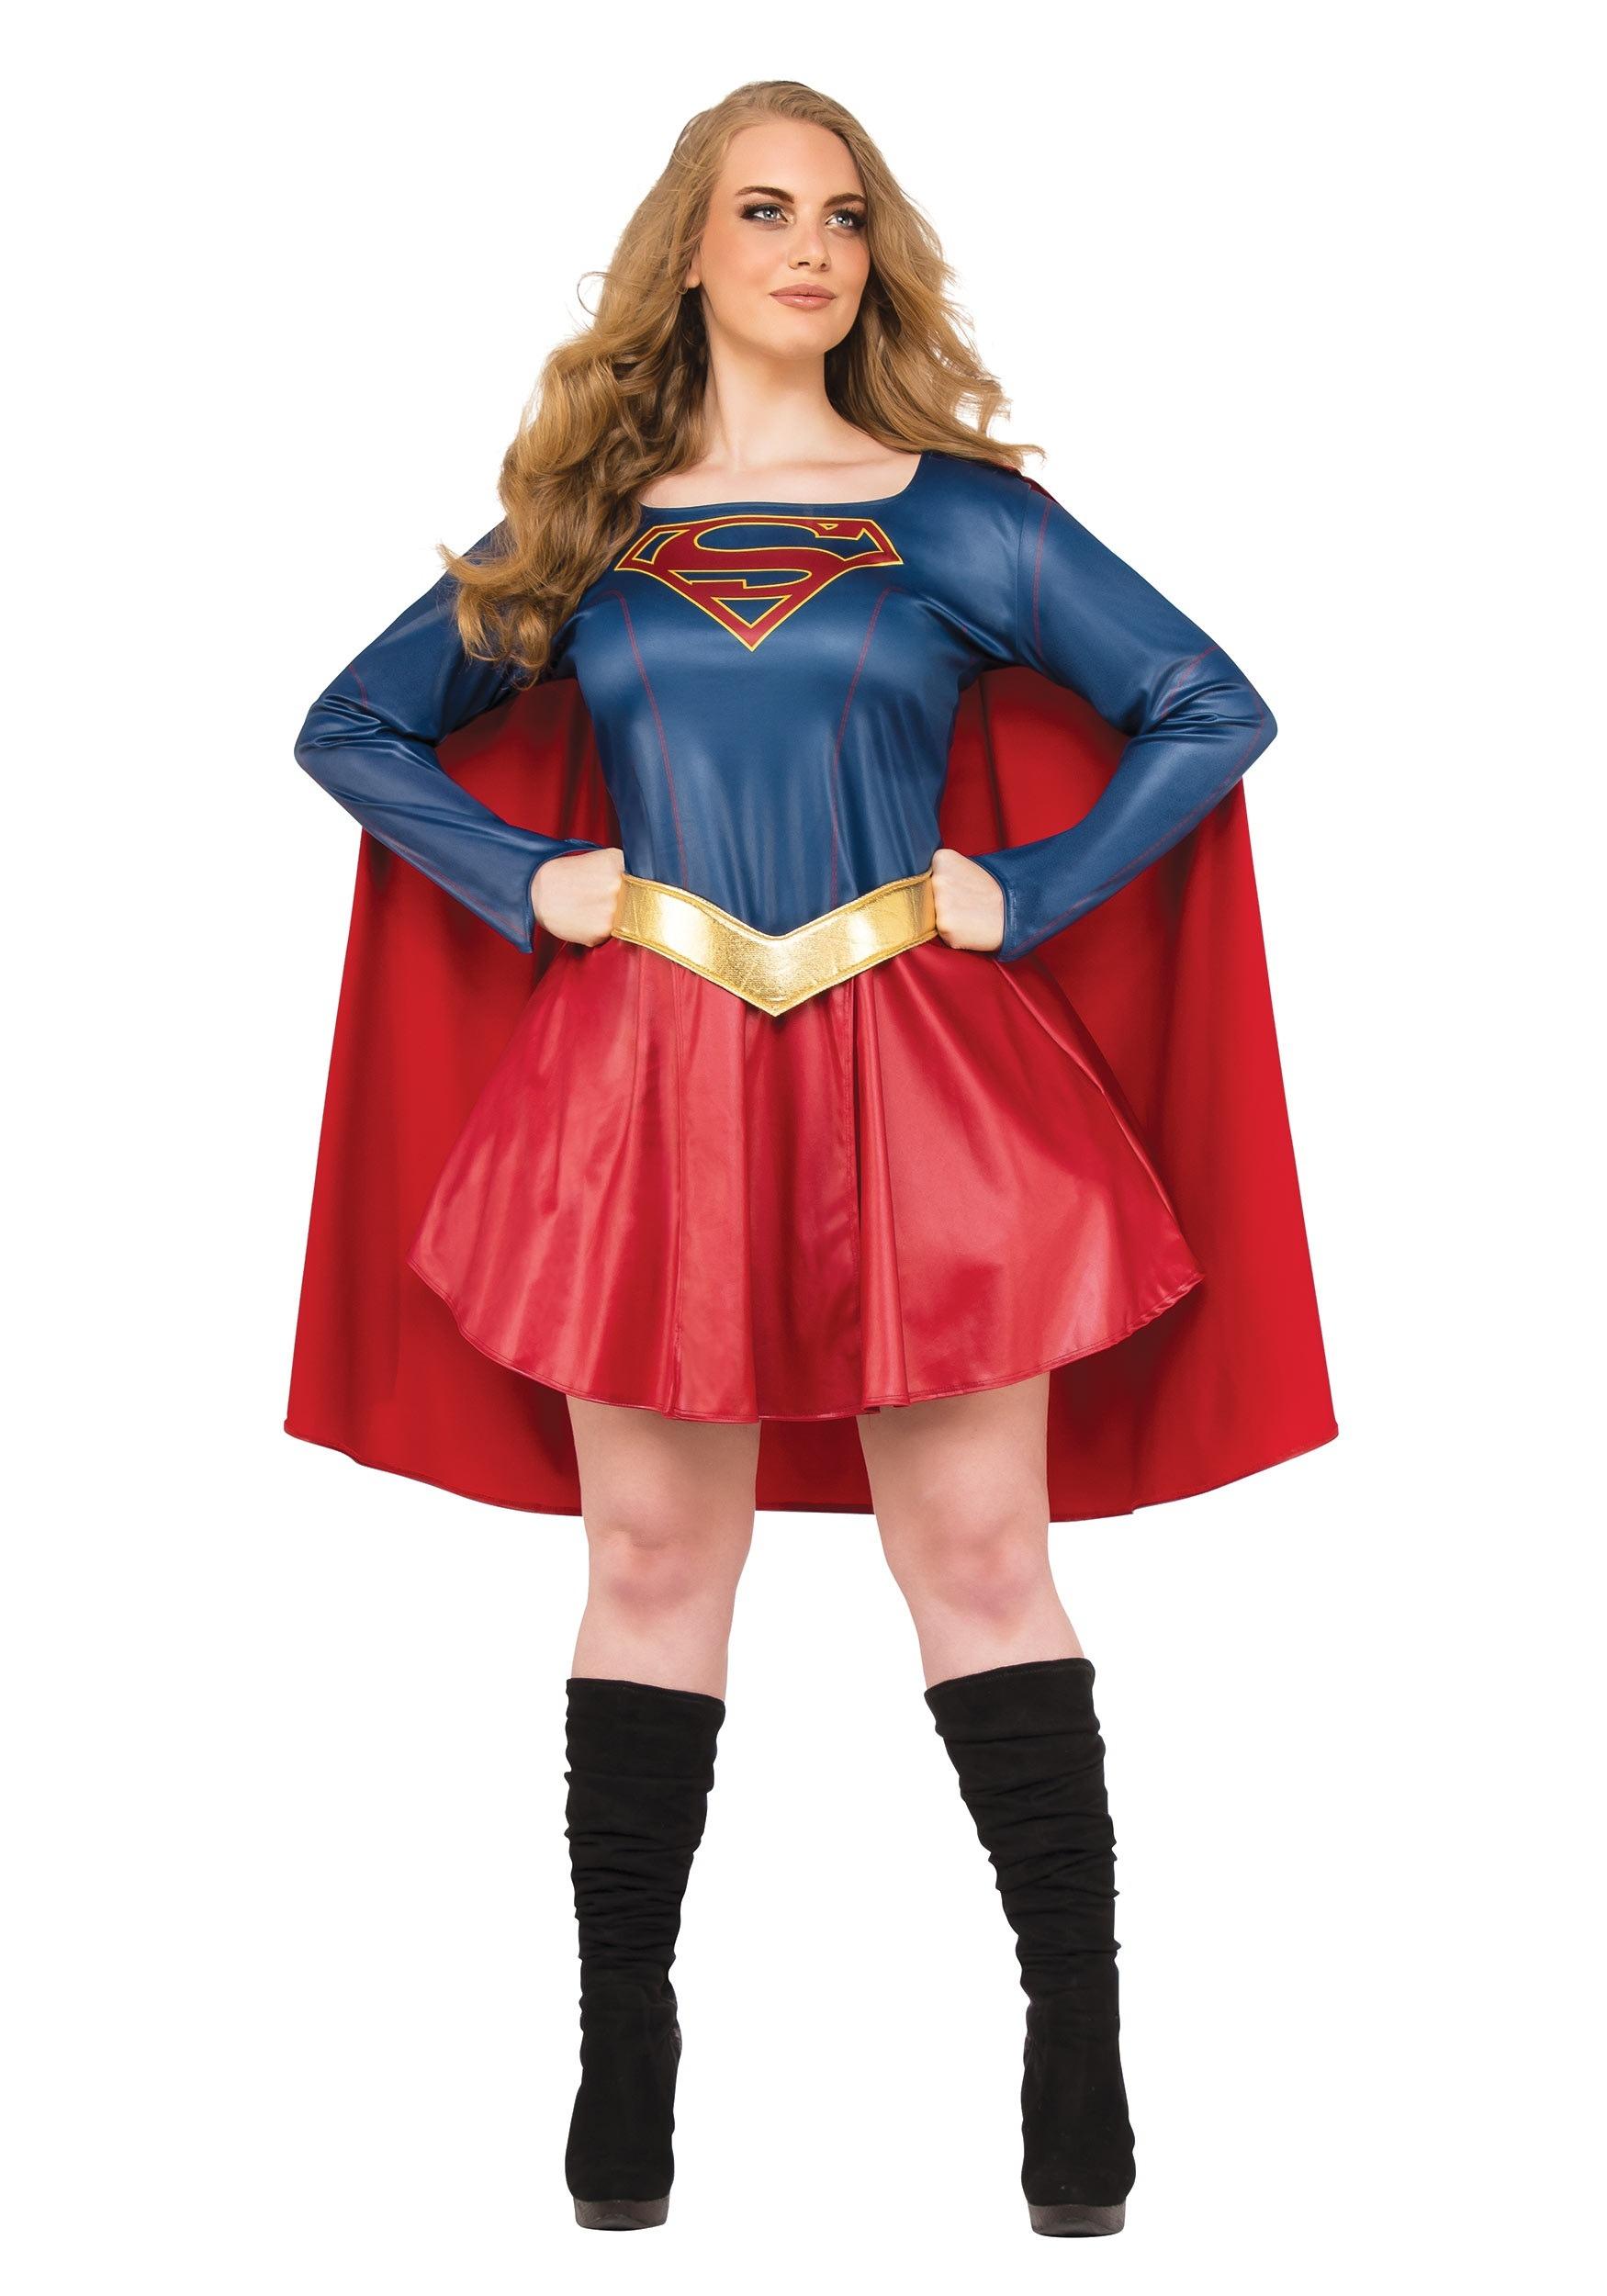 Plus Size Supergirl Tv Costume For Women